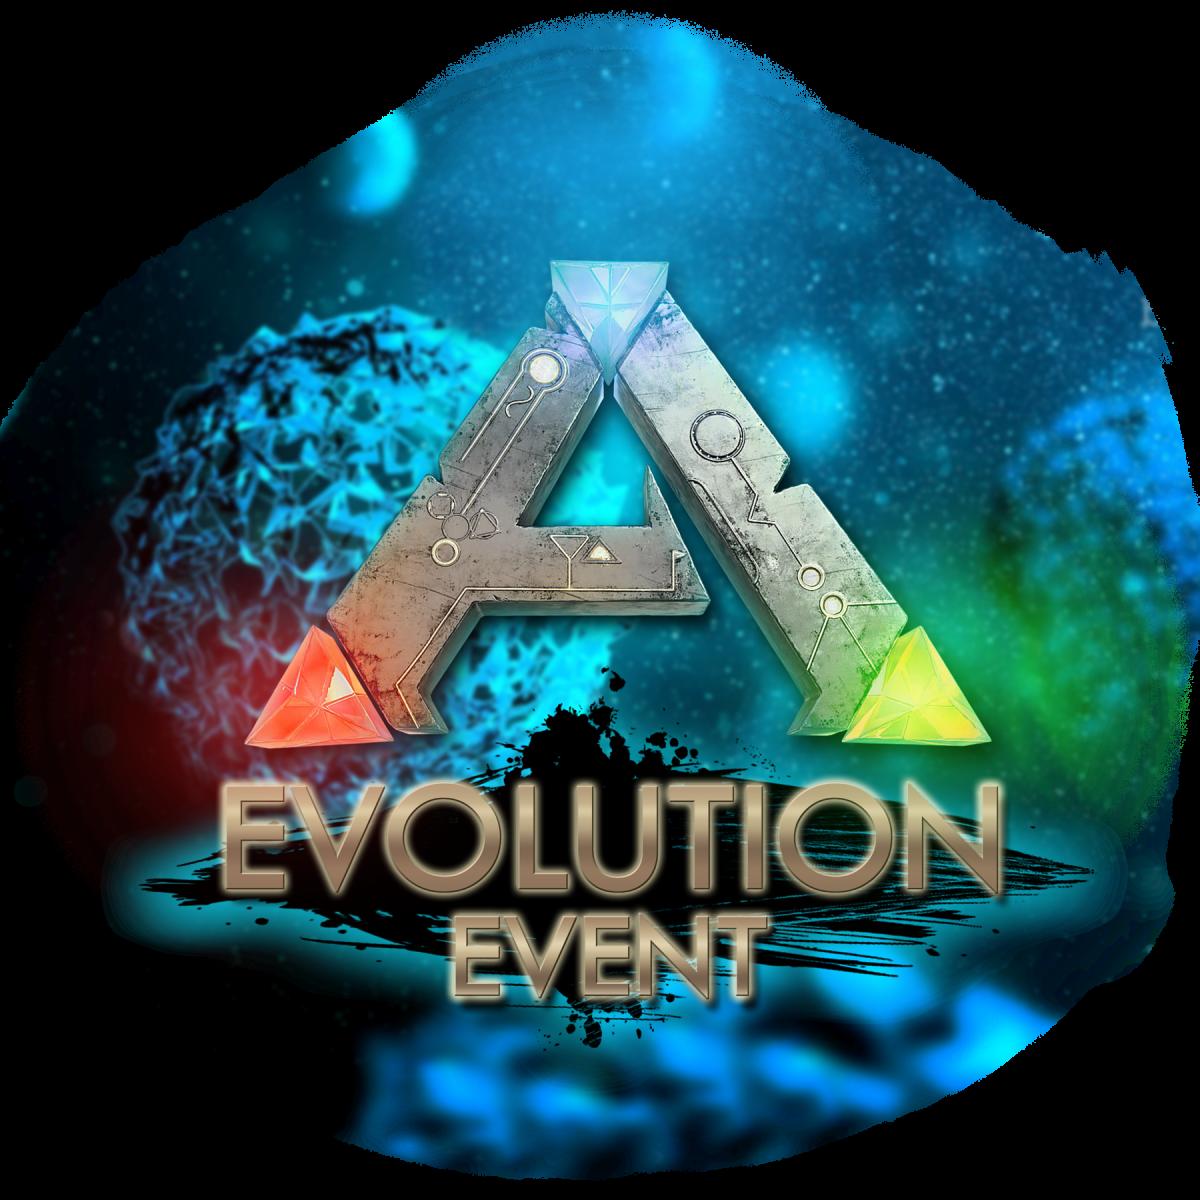 ARK: Evolution Event - Official ARK: Survival Evolved Wiki